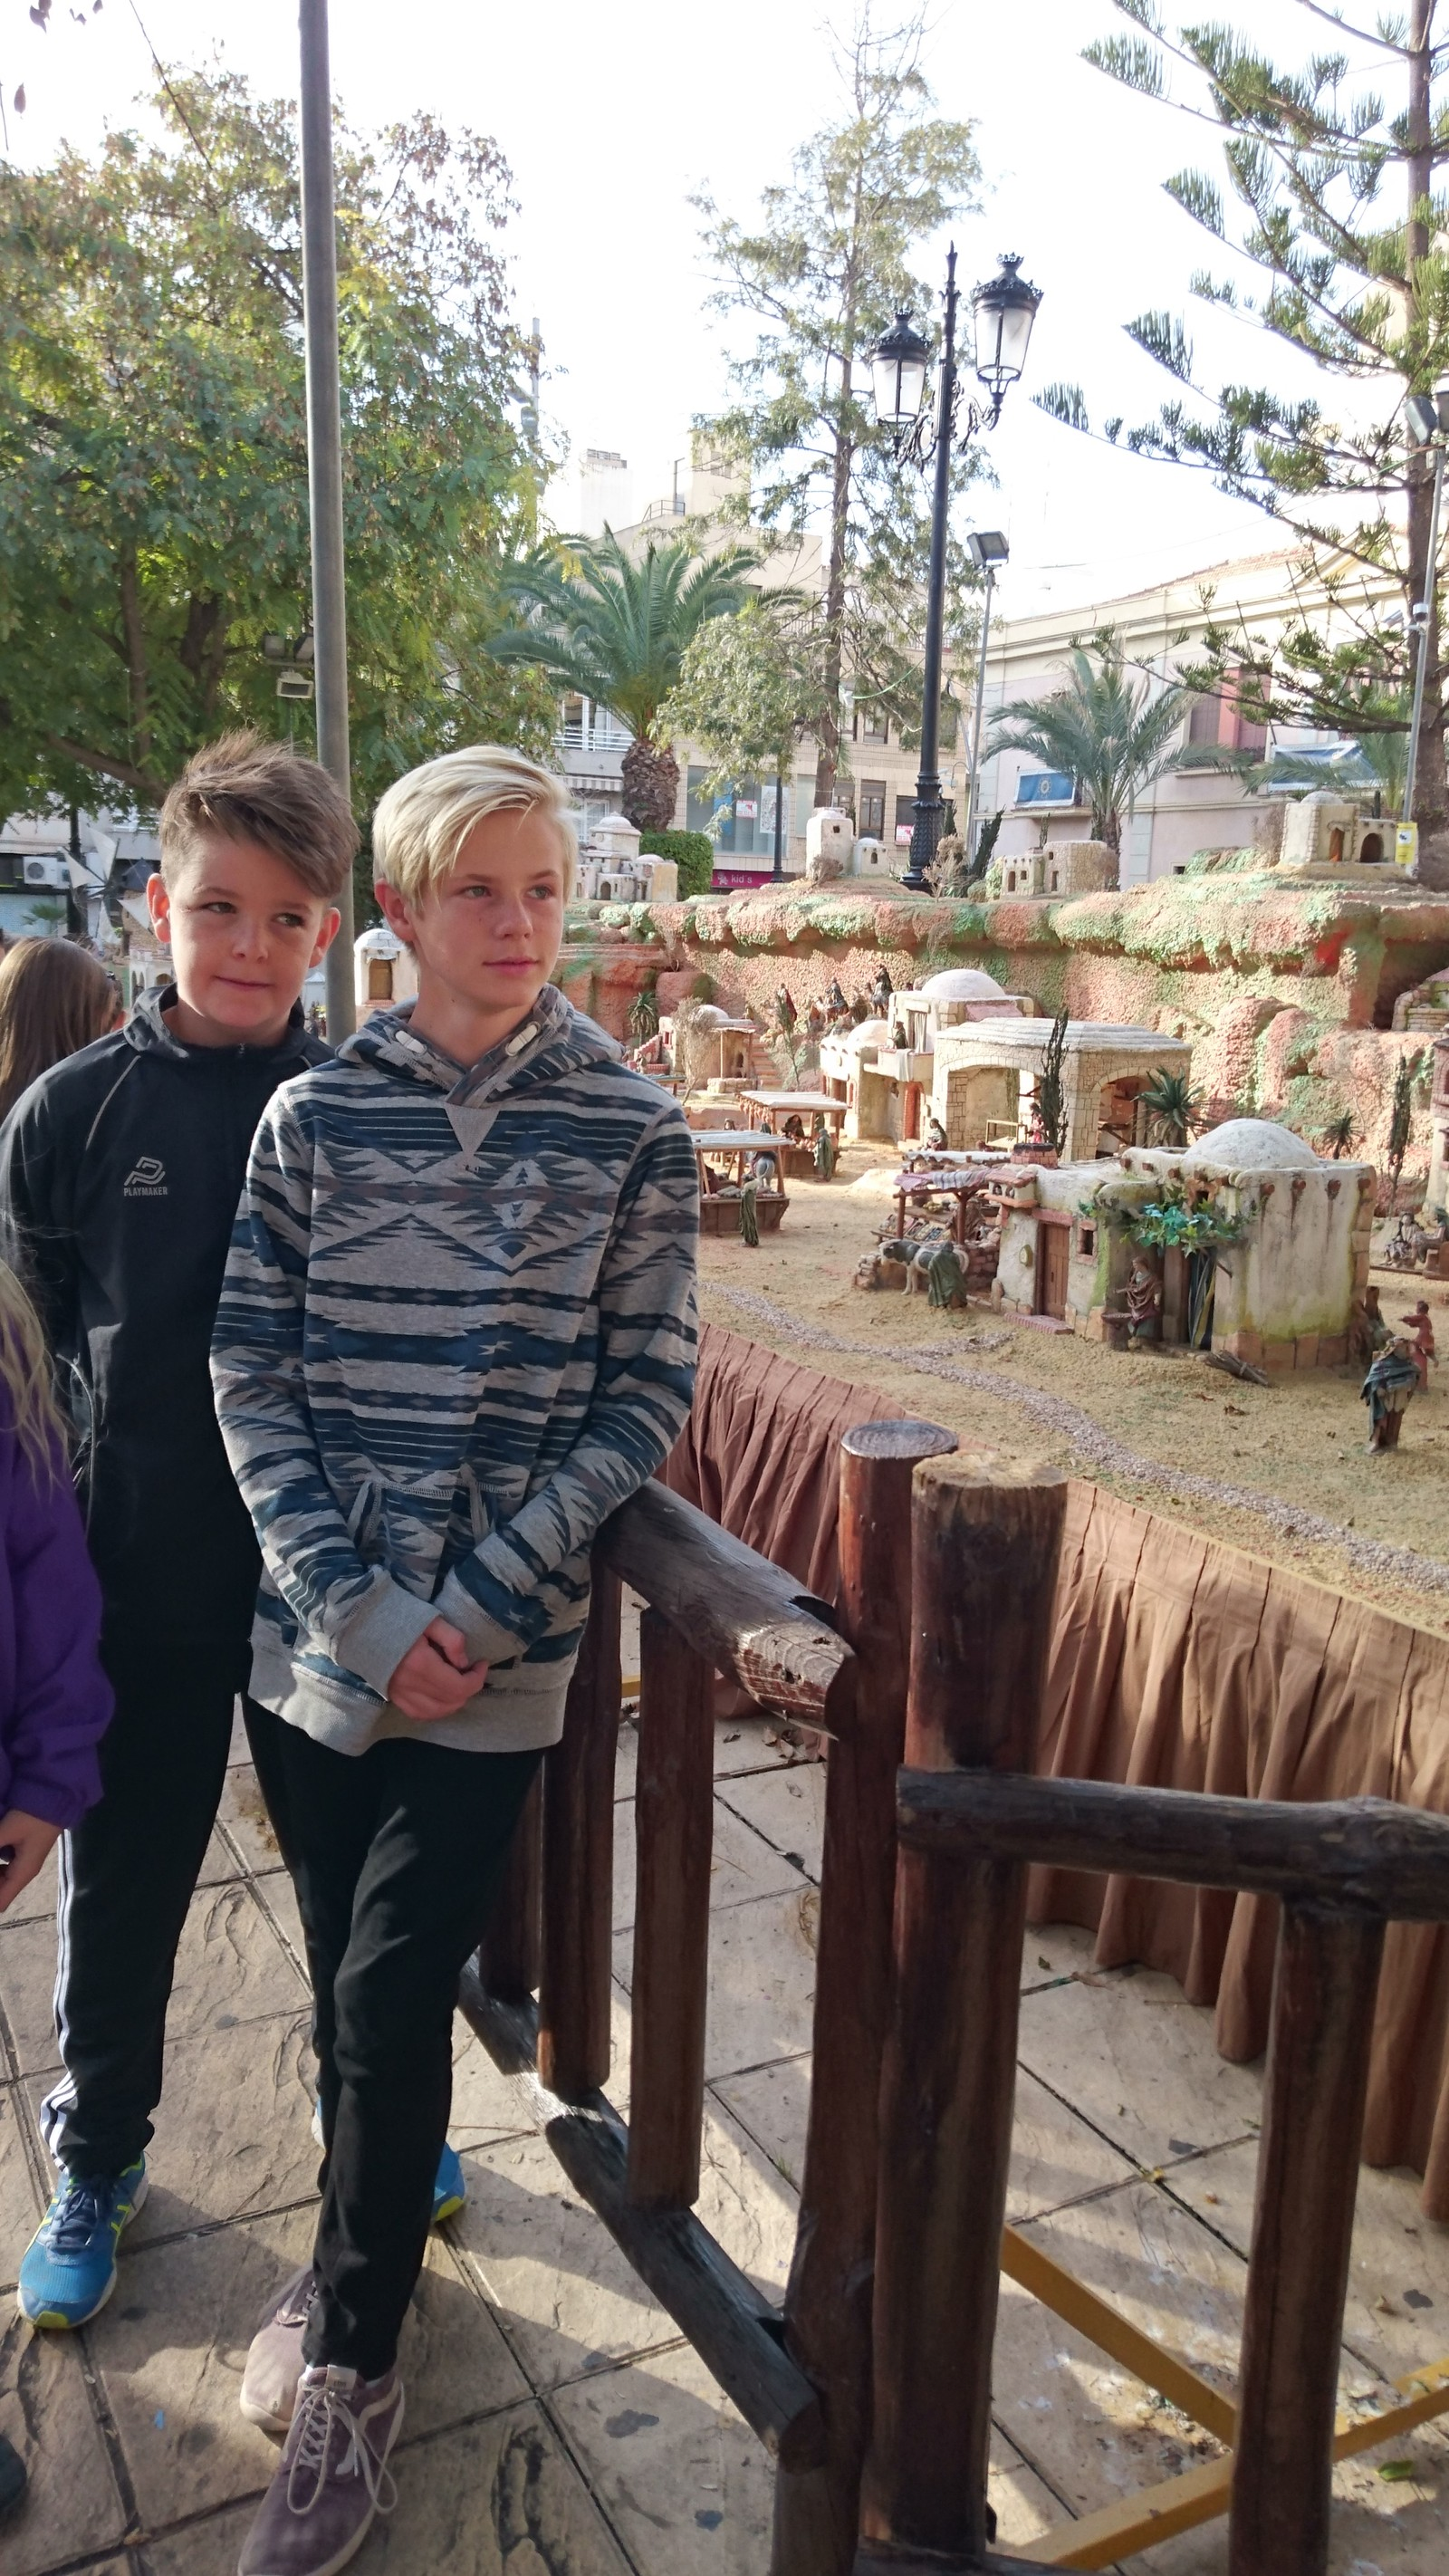 Elevene fra den norske skolen i Rojales besøkte denne uken El Belen på kirkeplassen i Torrevieja.